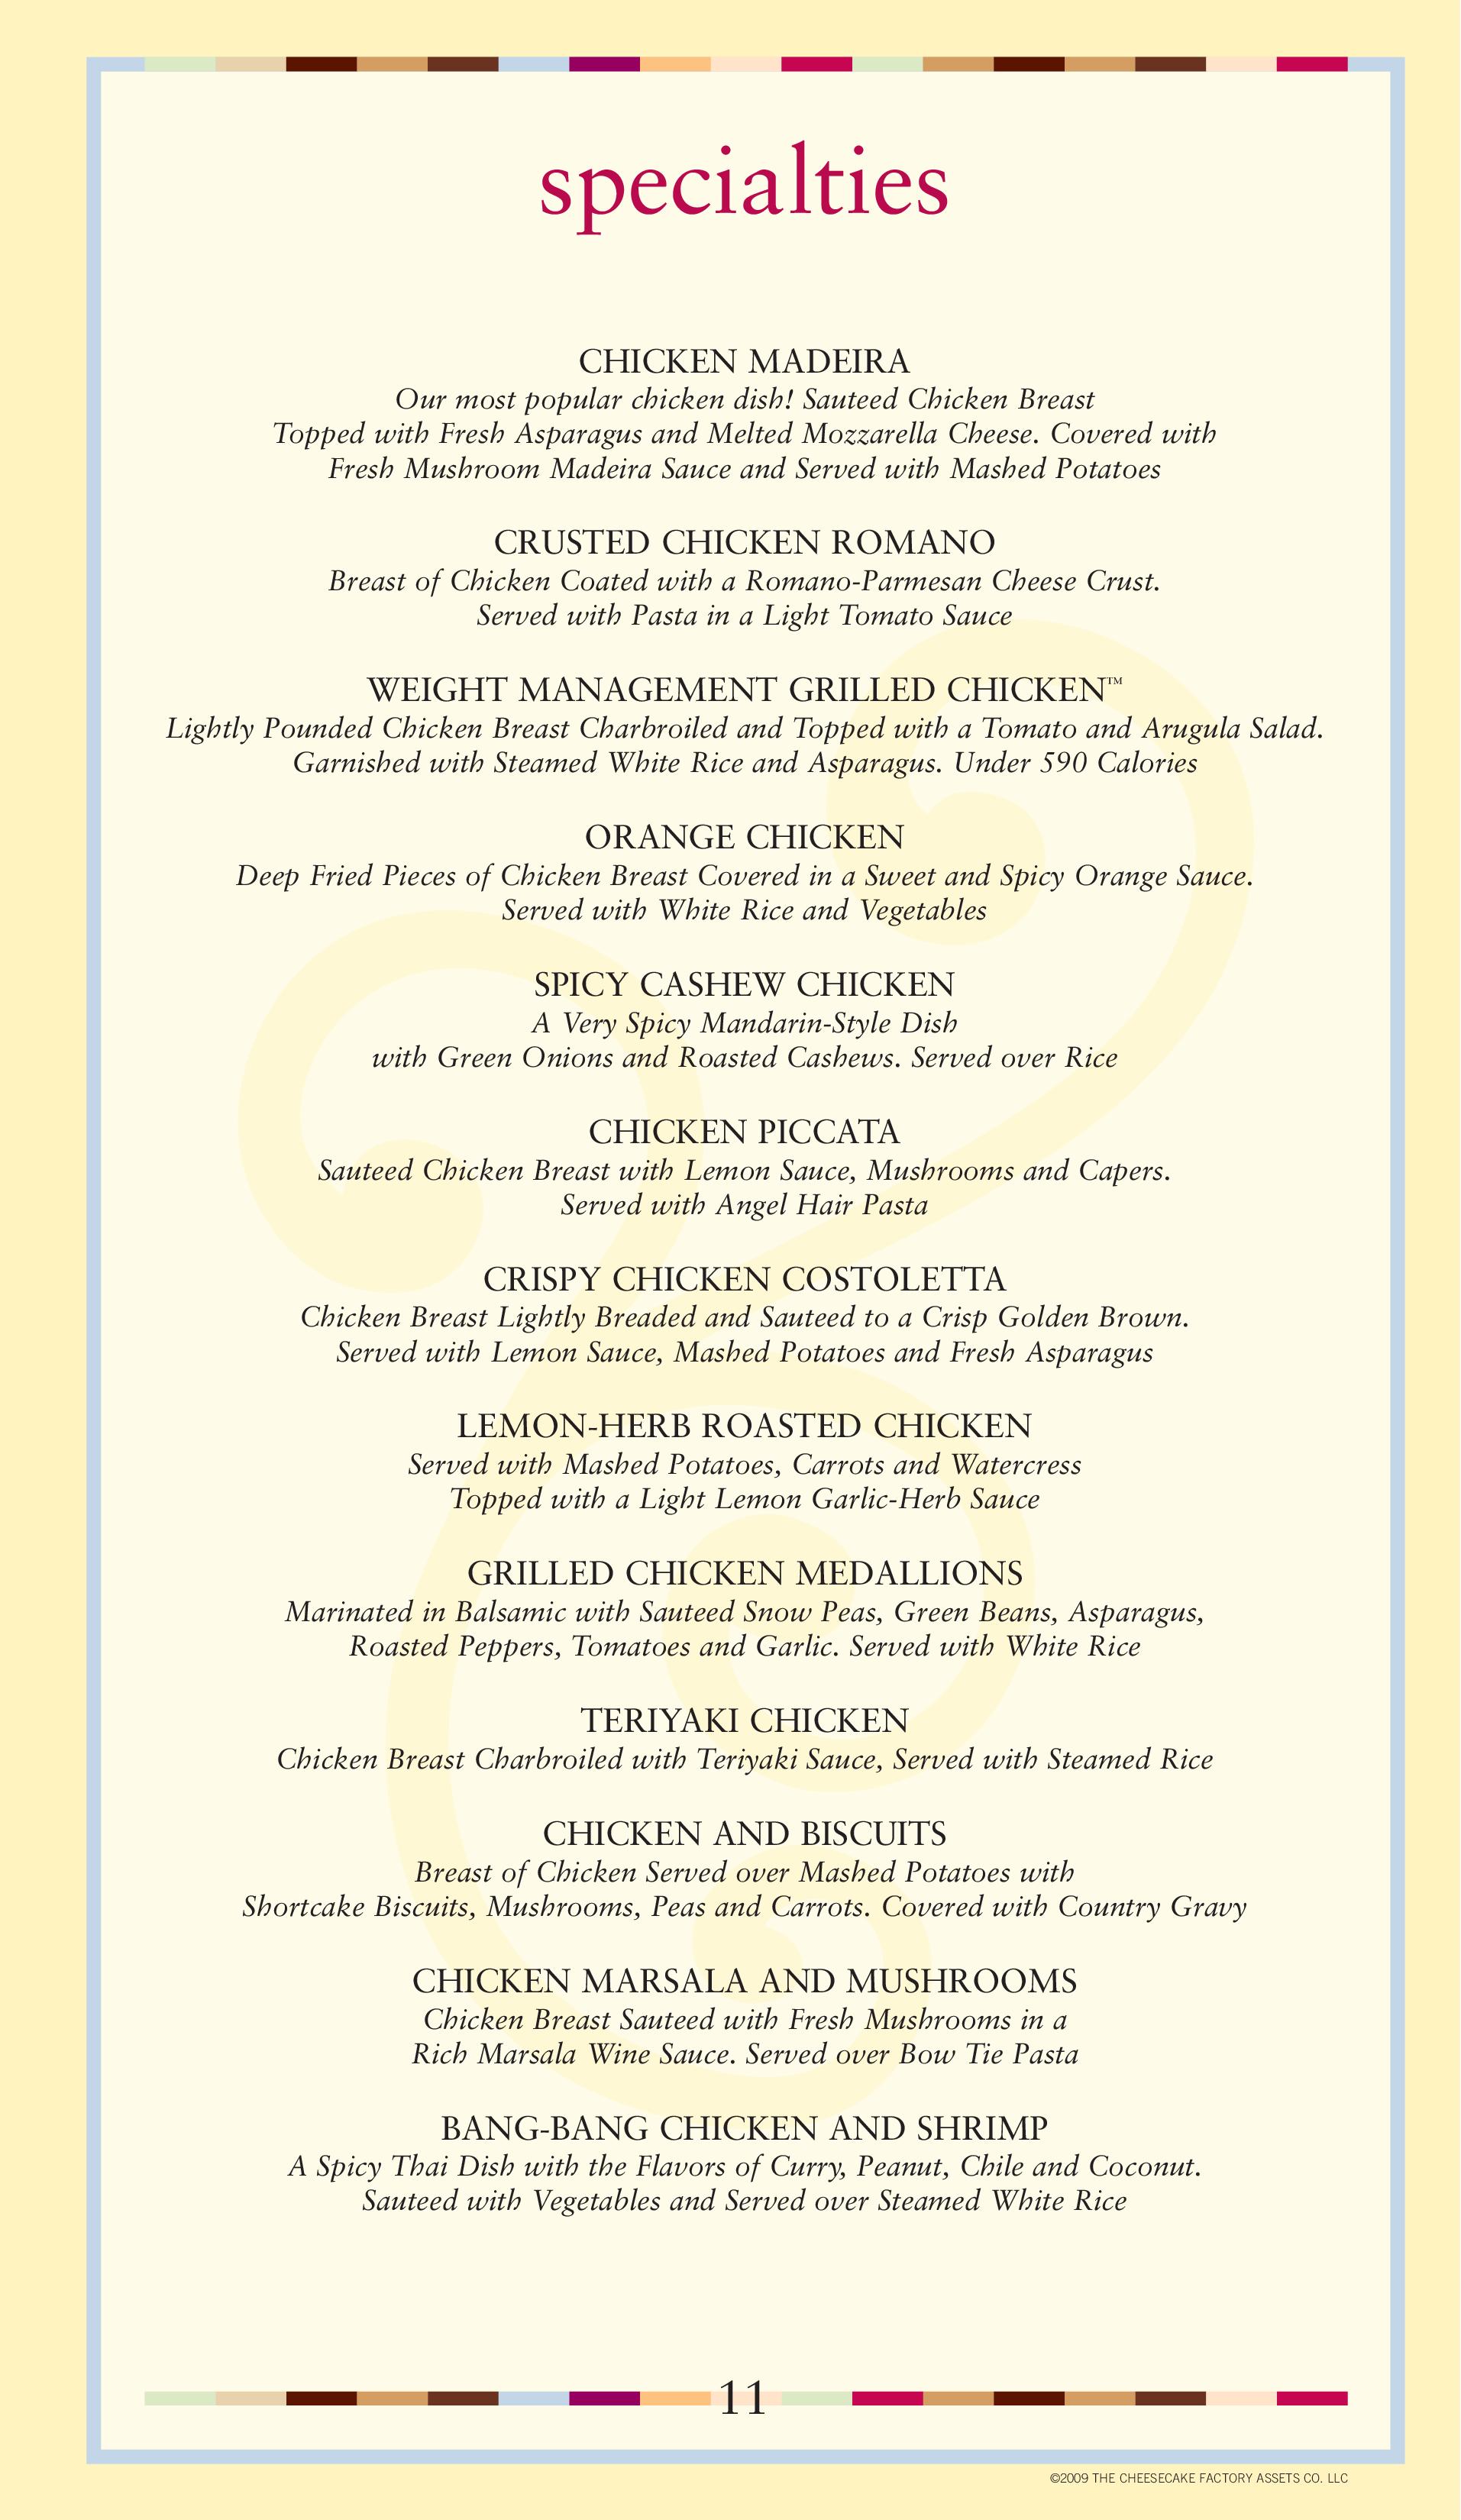 Wild image with printable cheesecake factory menu